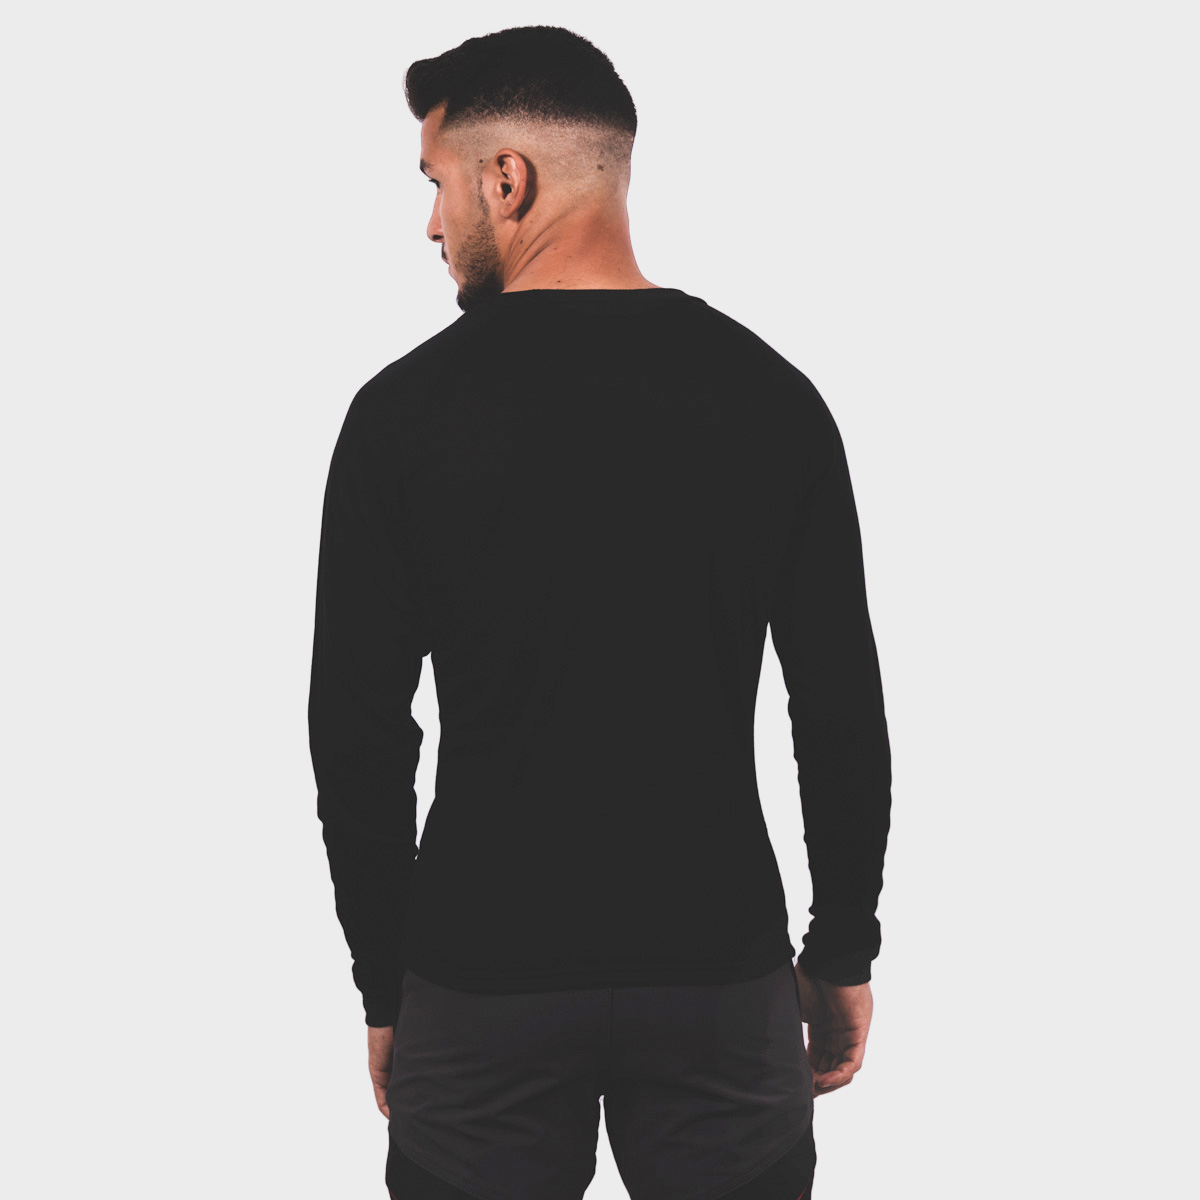 MAN'S NELION THERMAL T-SHIRT BLACK